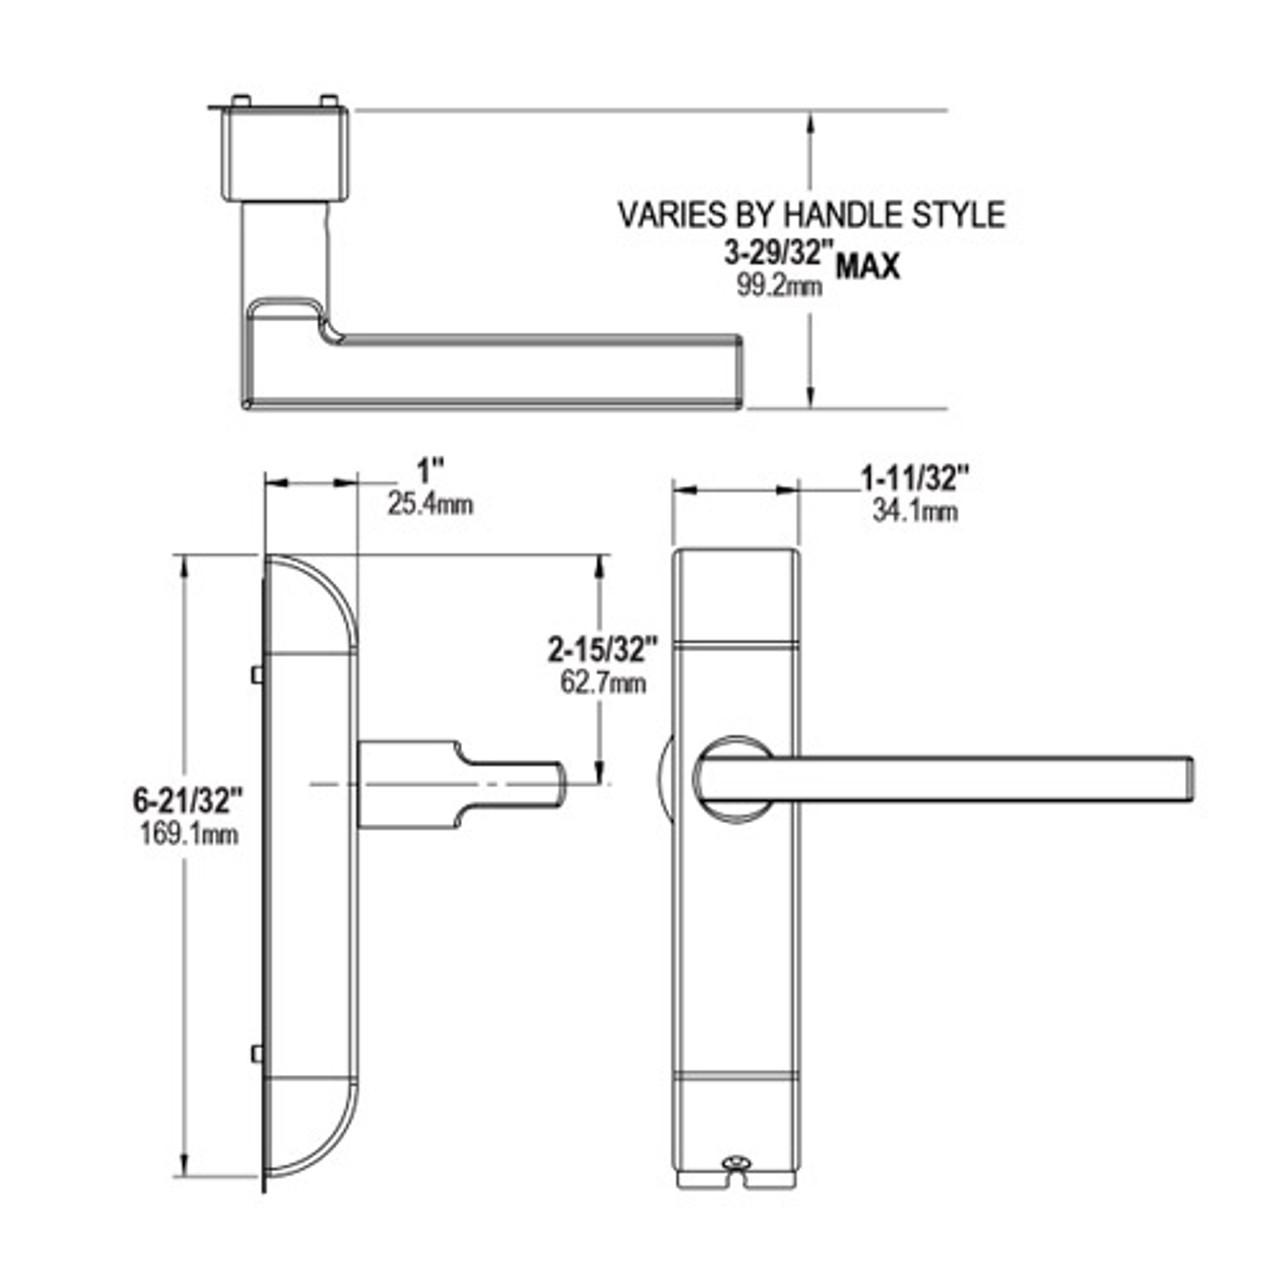 4600-MV-511-US32D Adams Rite MV Designer handle Dimensional View